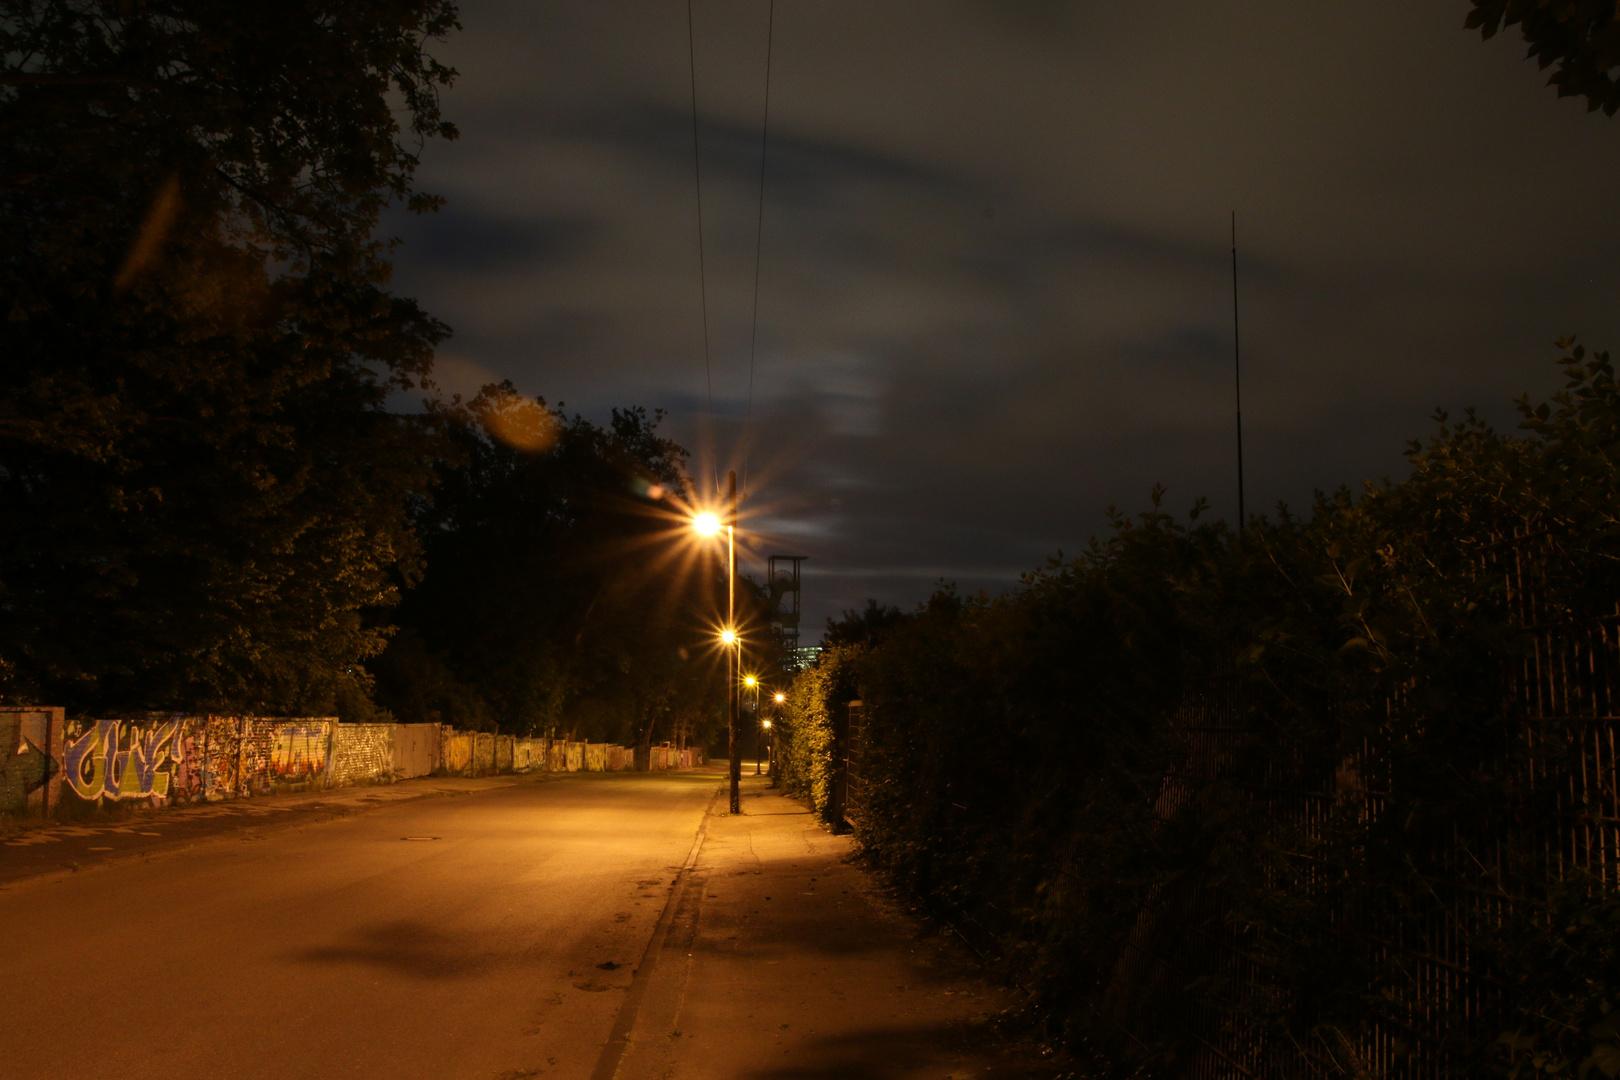 Ruhrgebietsidylle bei Nacht